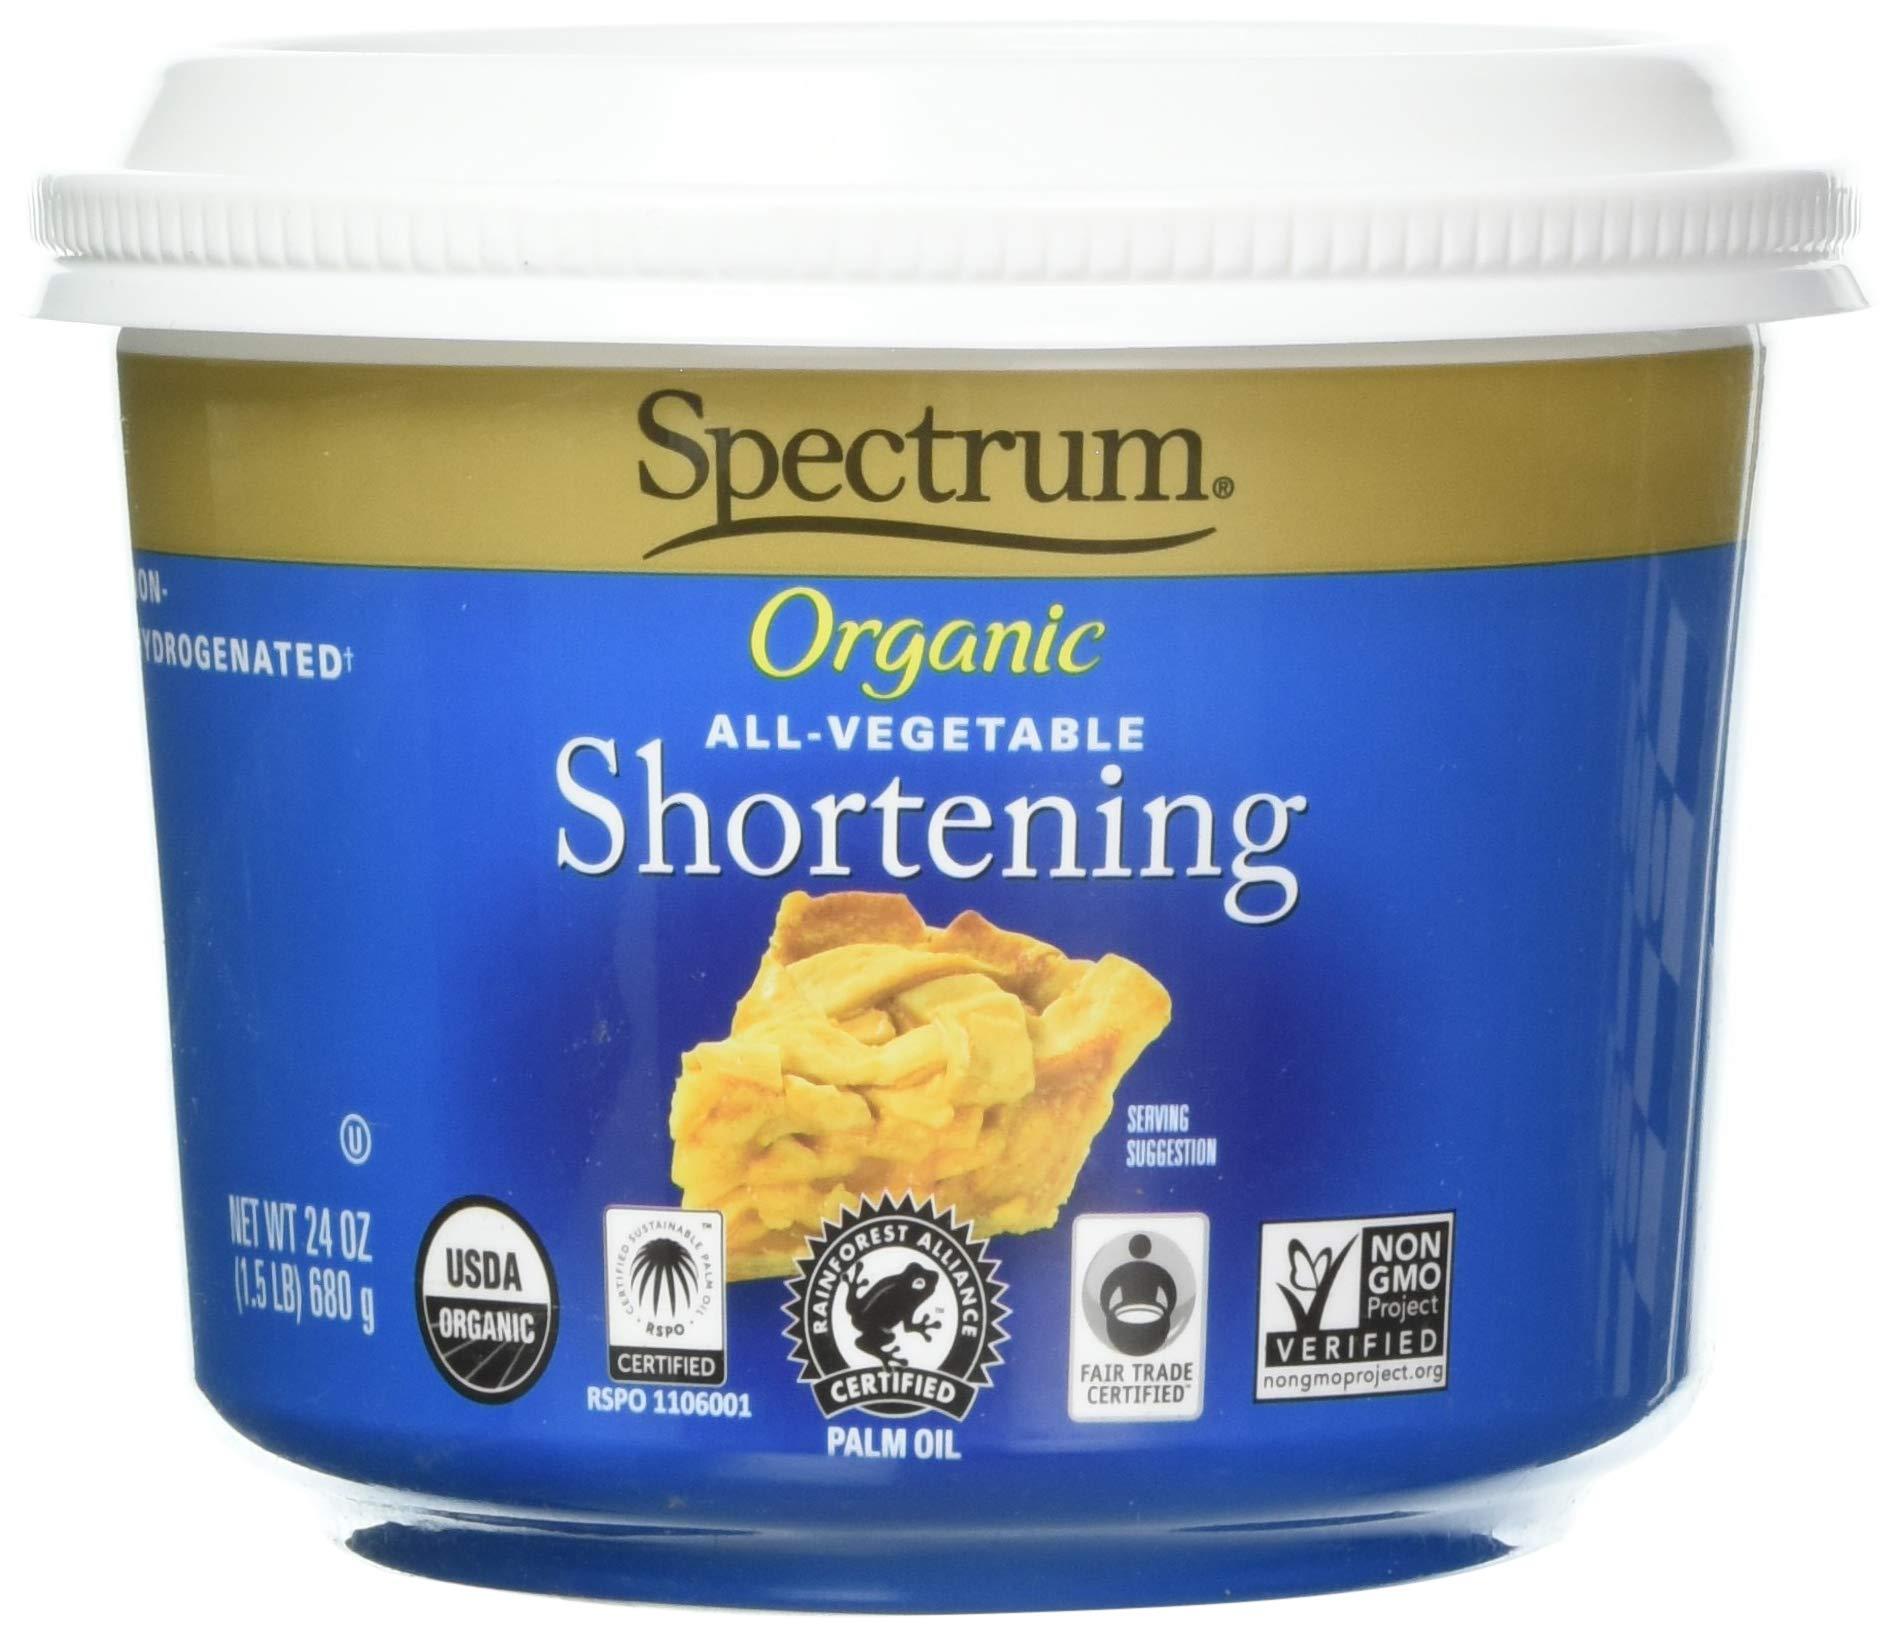 Spectrum Naturals Organic Shortening, All Vegetable, 24 oz by Spectrum